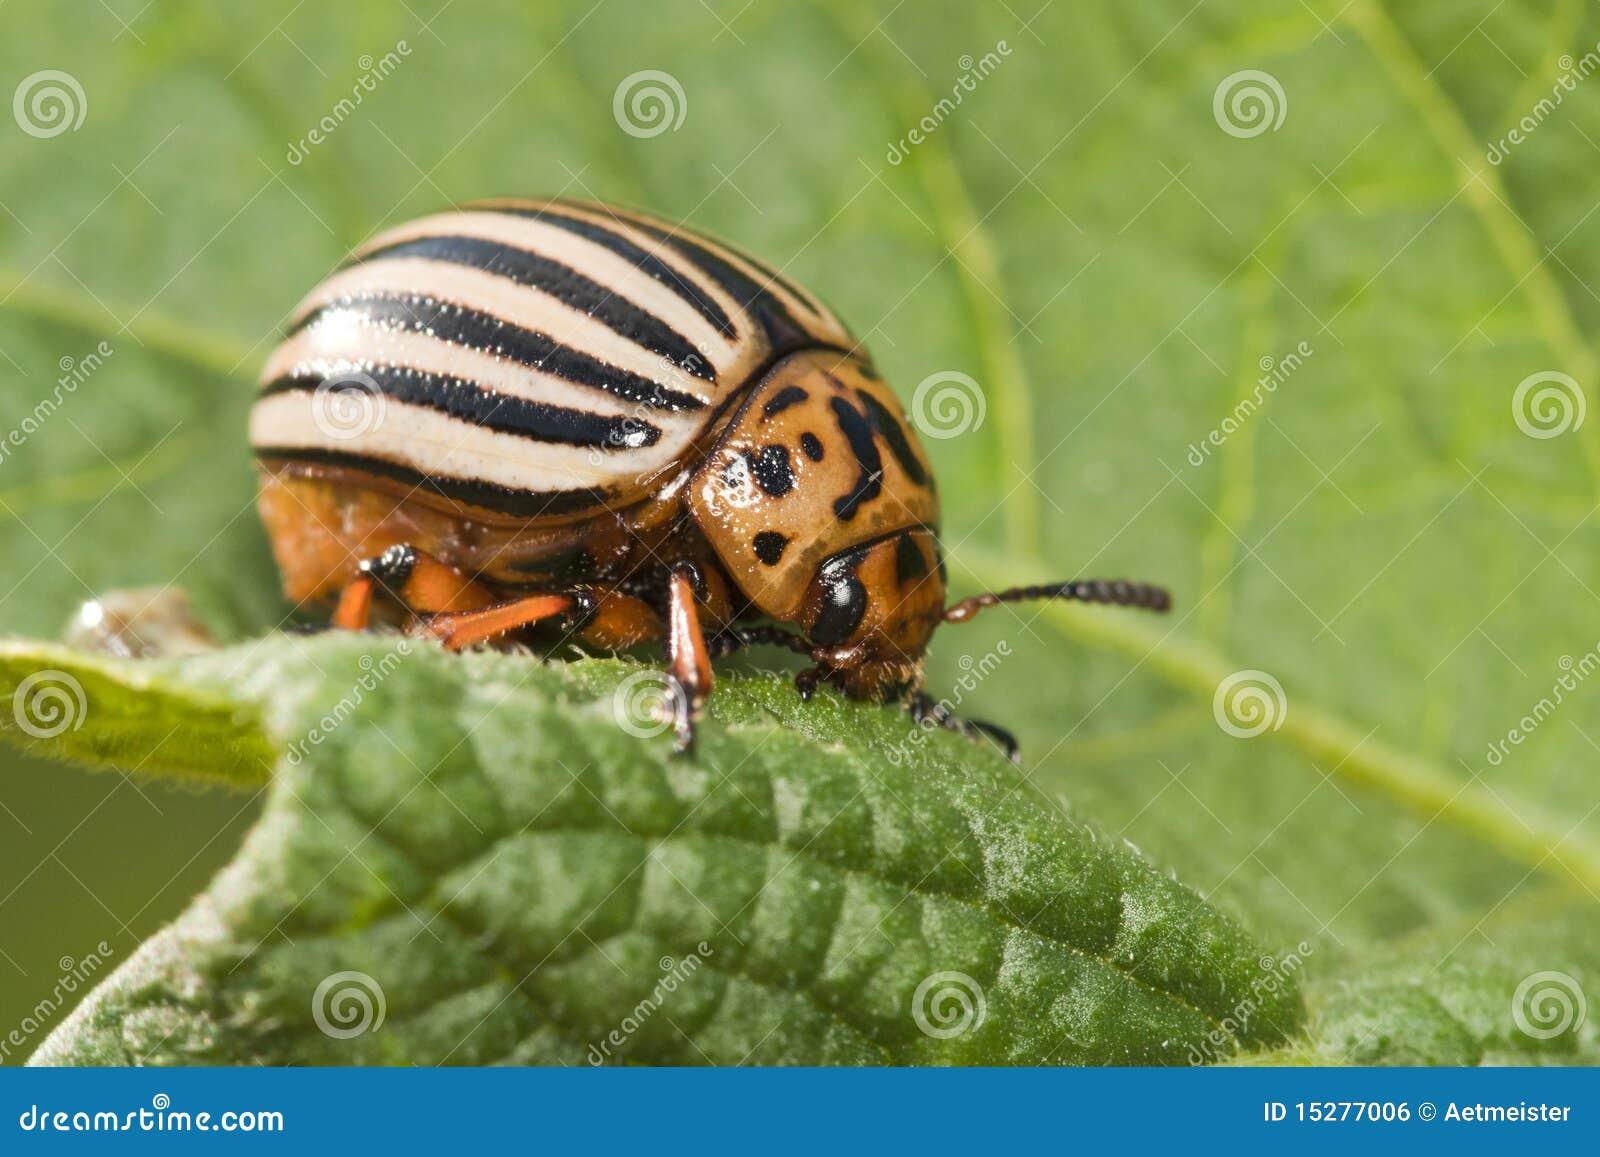 Potato bug o